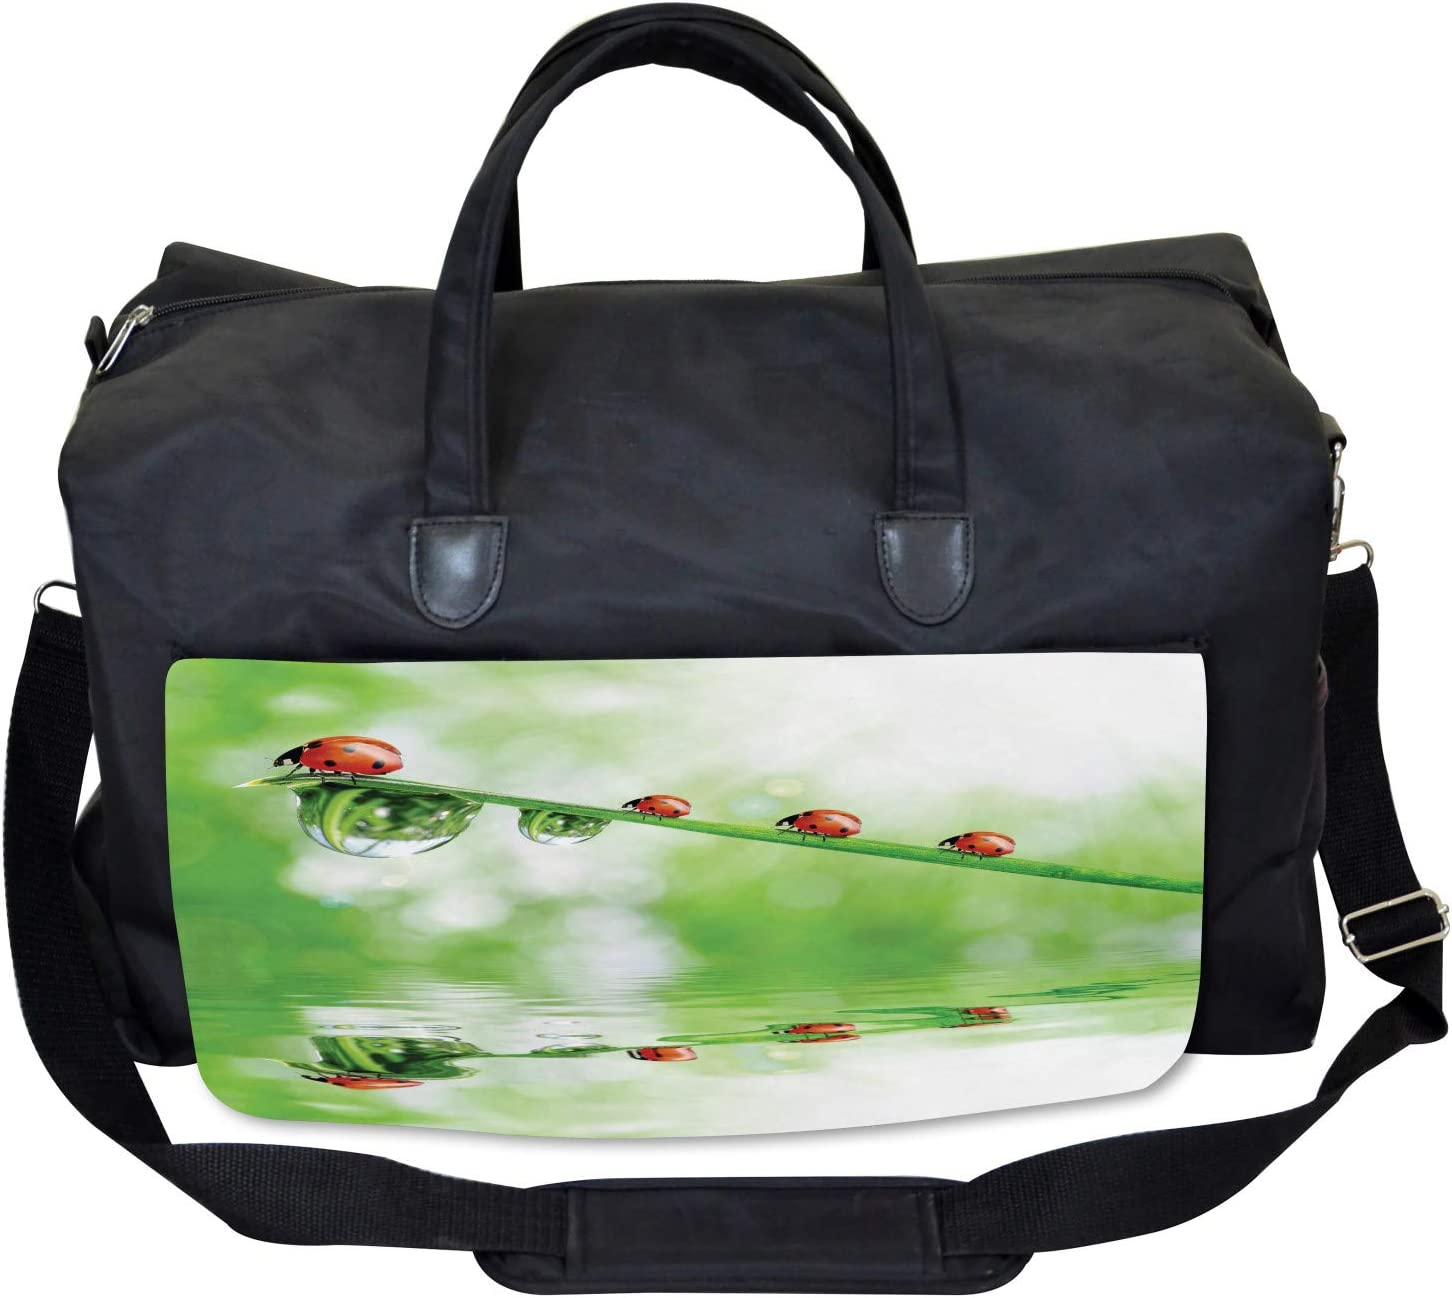 Ambesonne Nature Gym Bag Large Weekender Carry-on Ladybug on Water Image